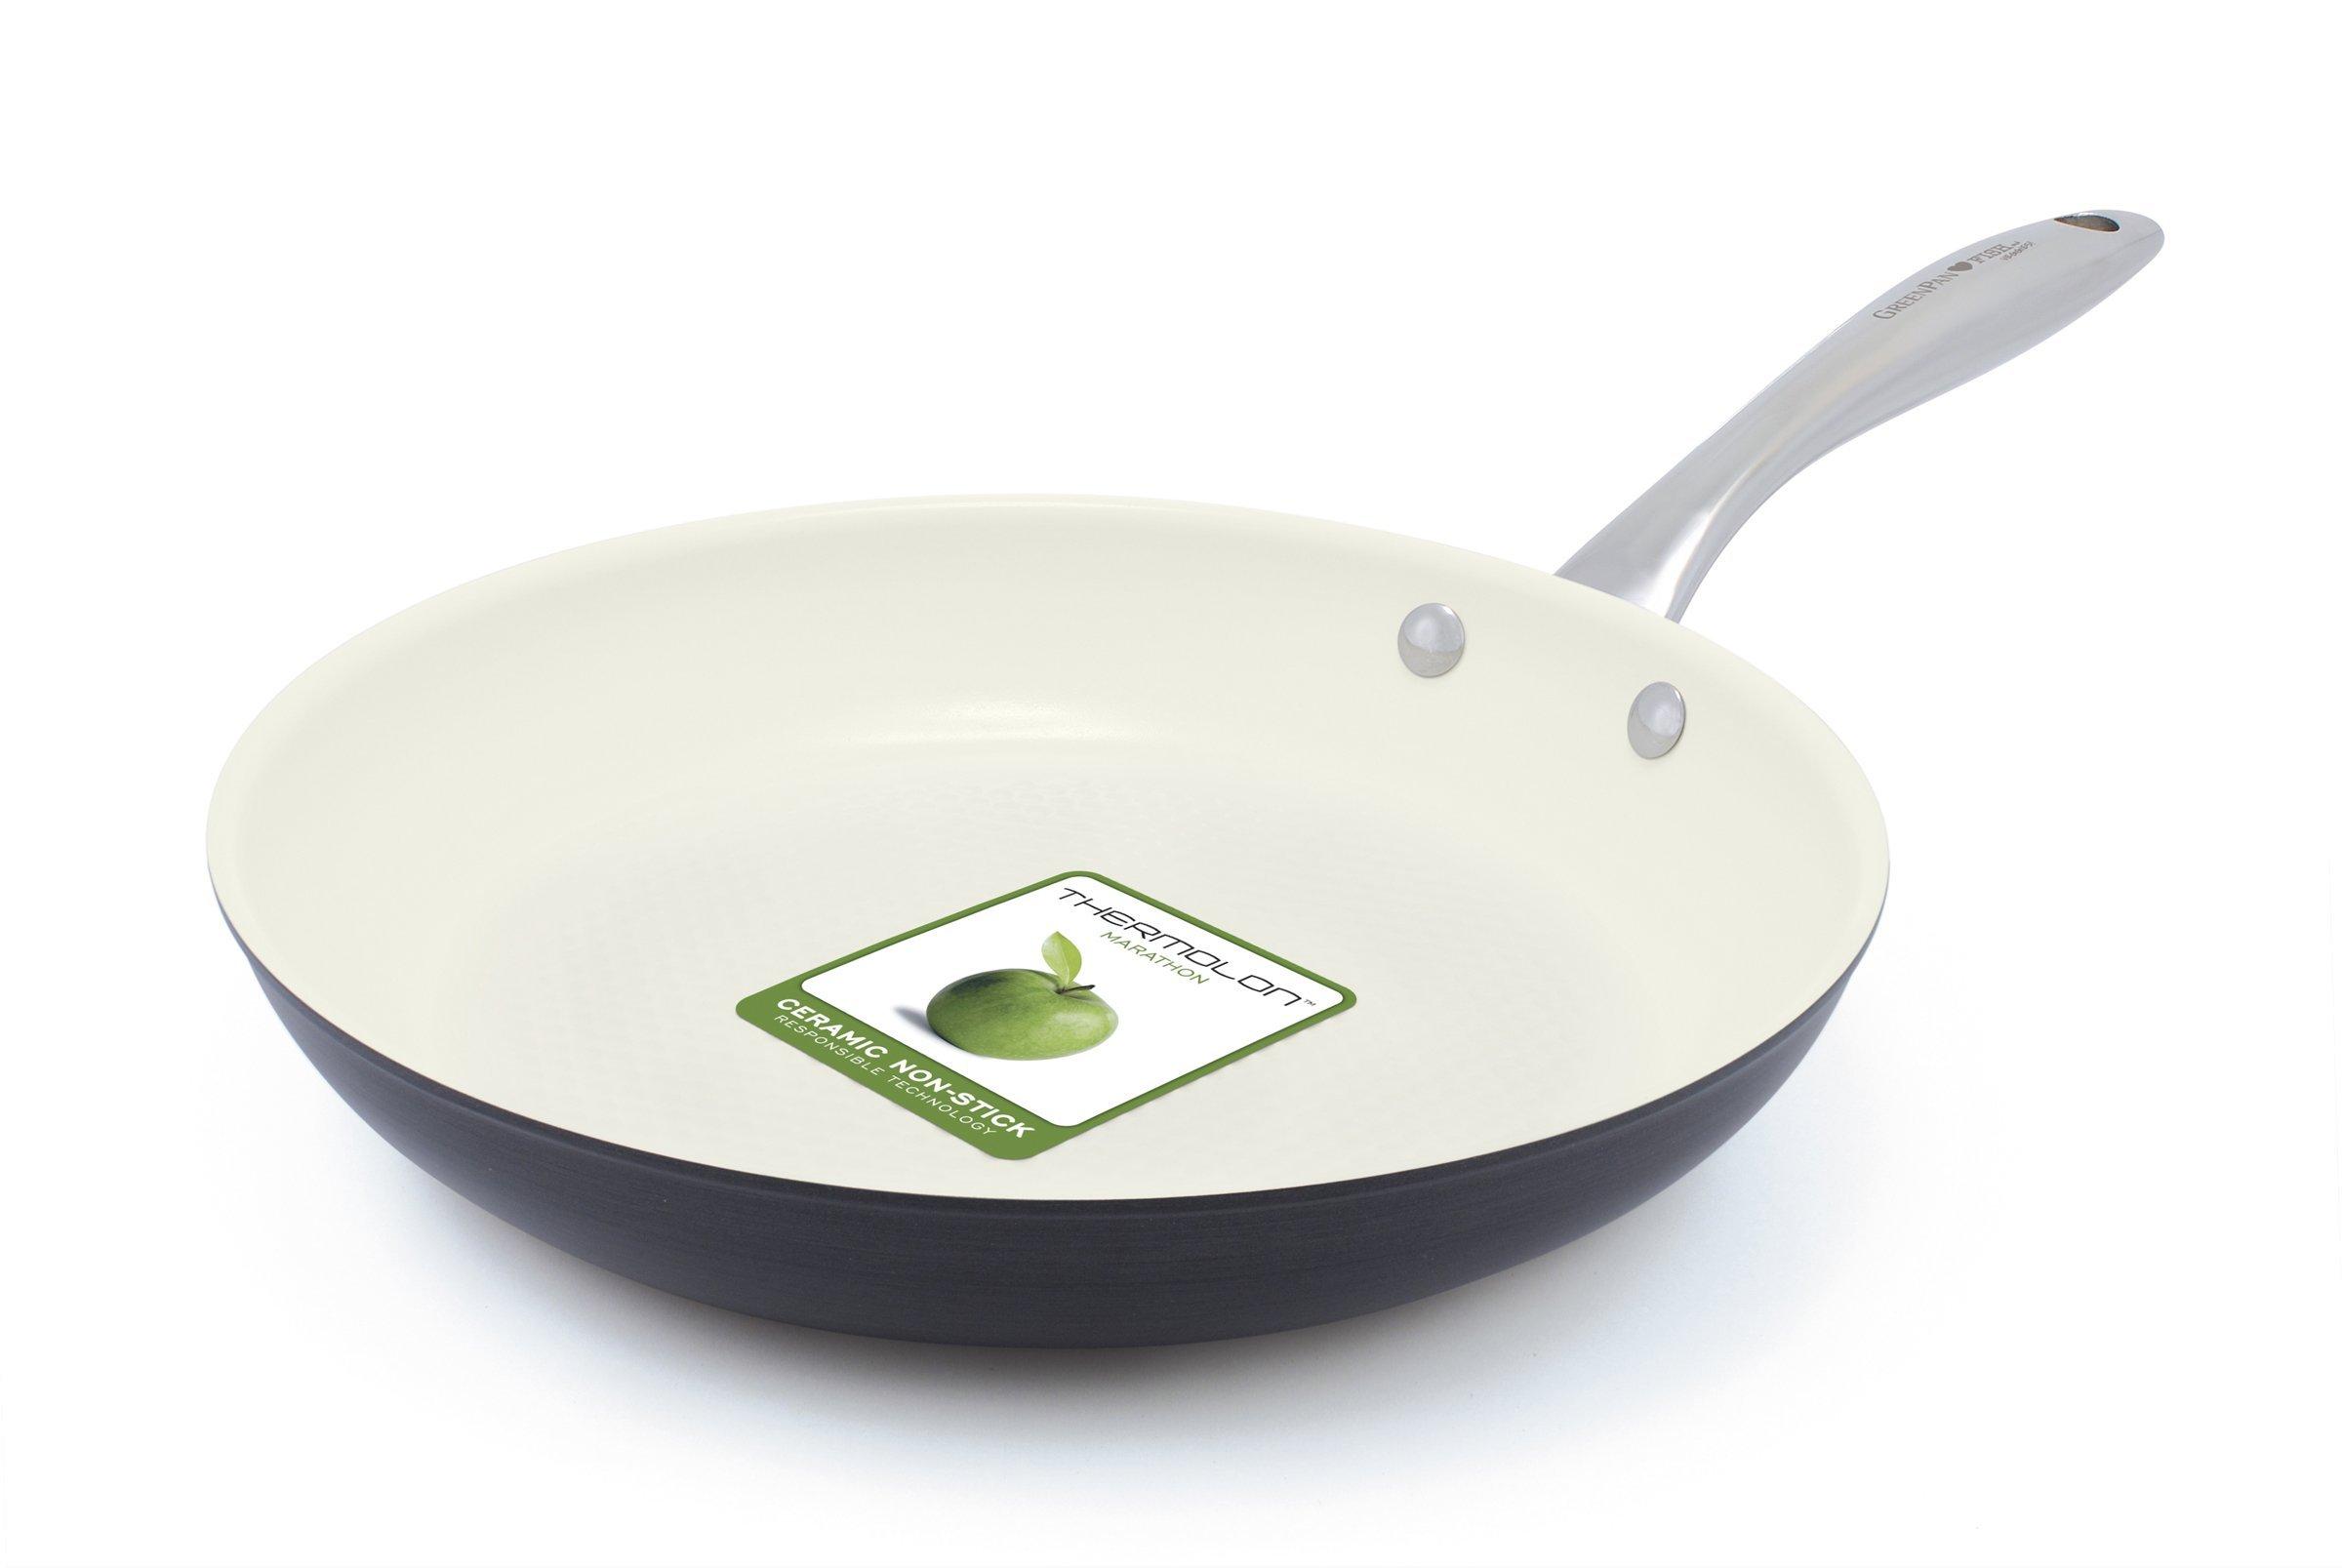 GreenPan Lima 3D ''I Love Fish & Veggies and ''I Love Meat'' Dishwasher Safe Hard Anodized Fry Pan Set, 10''/11'', Gray/Cream